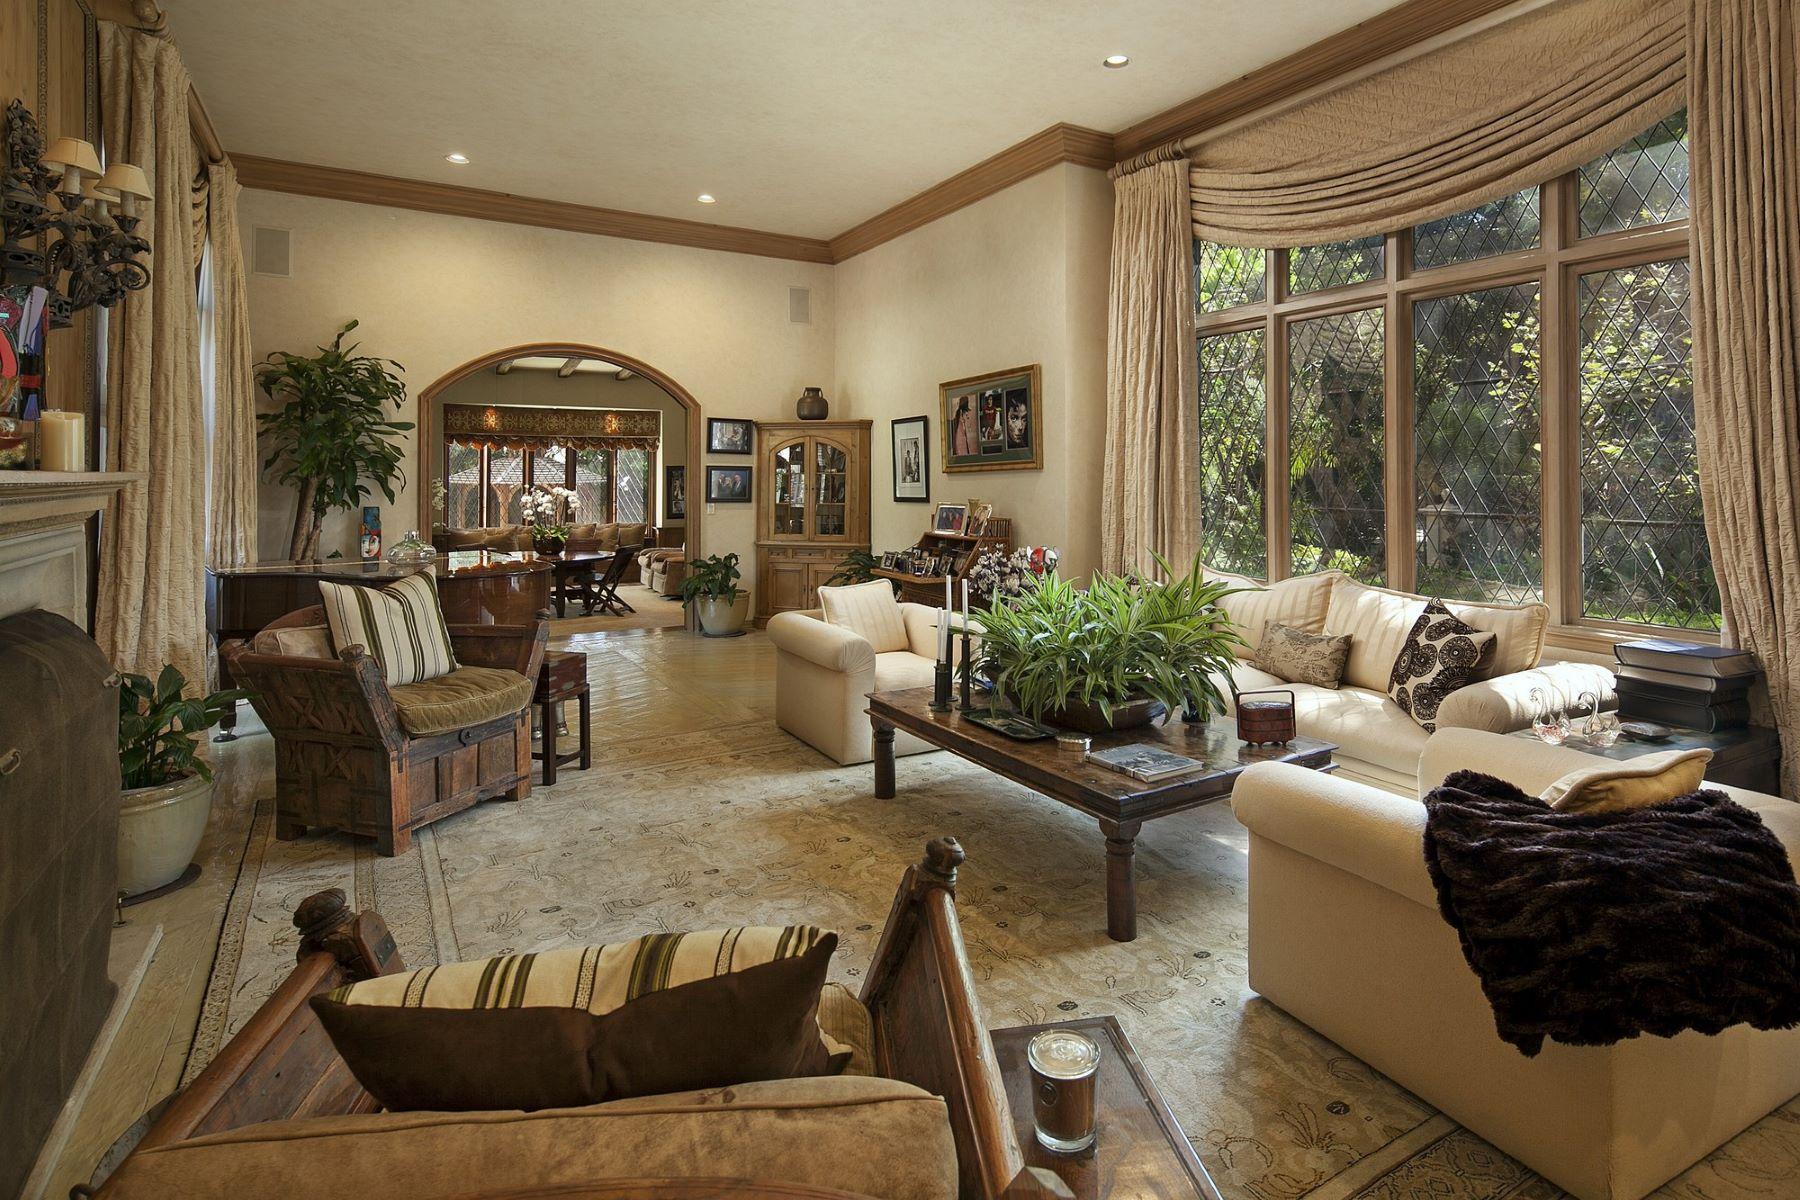 Additional photo for property listing at Historic Warner Estate 1006 Rexford Drive 比佛利山庄, 加利福尼亚州 90210 美国